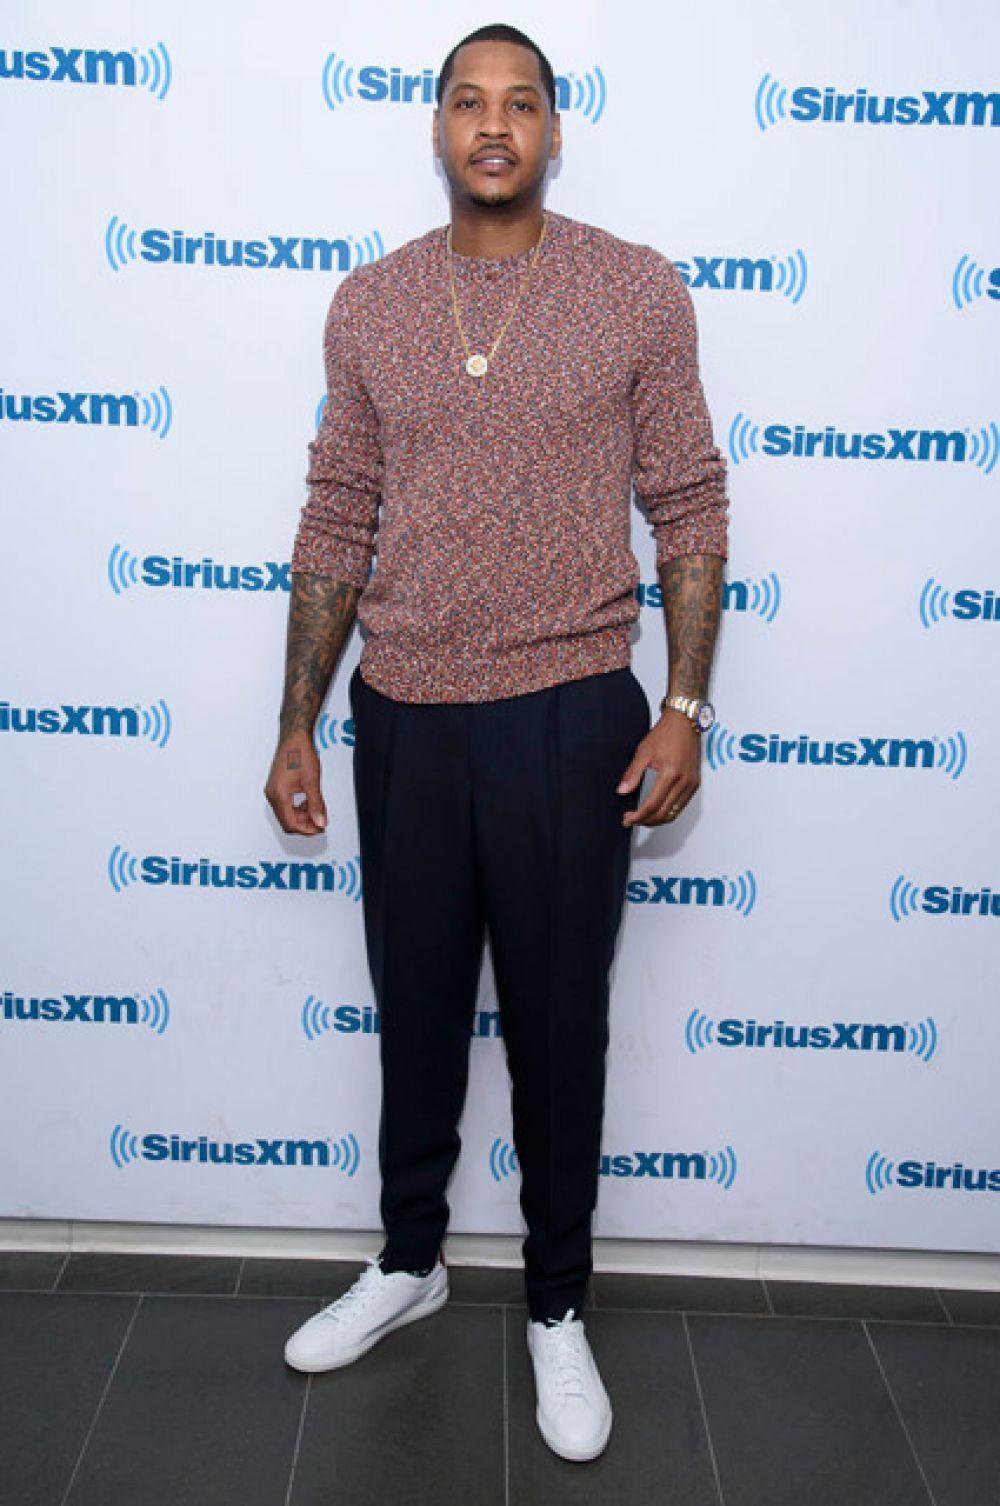 18-е место — баскетболист Кармело Энтони, играющий в клубе «Нью-Йорк Никс».